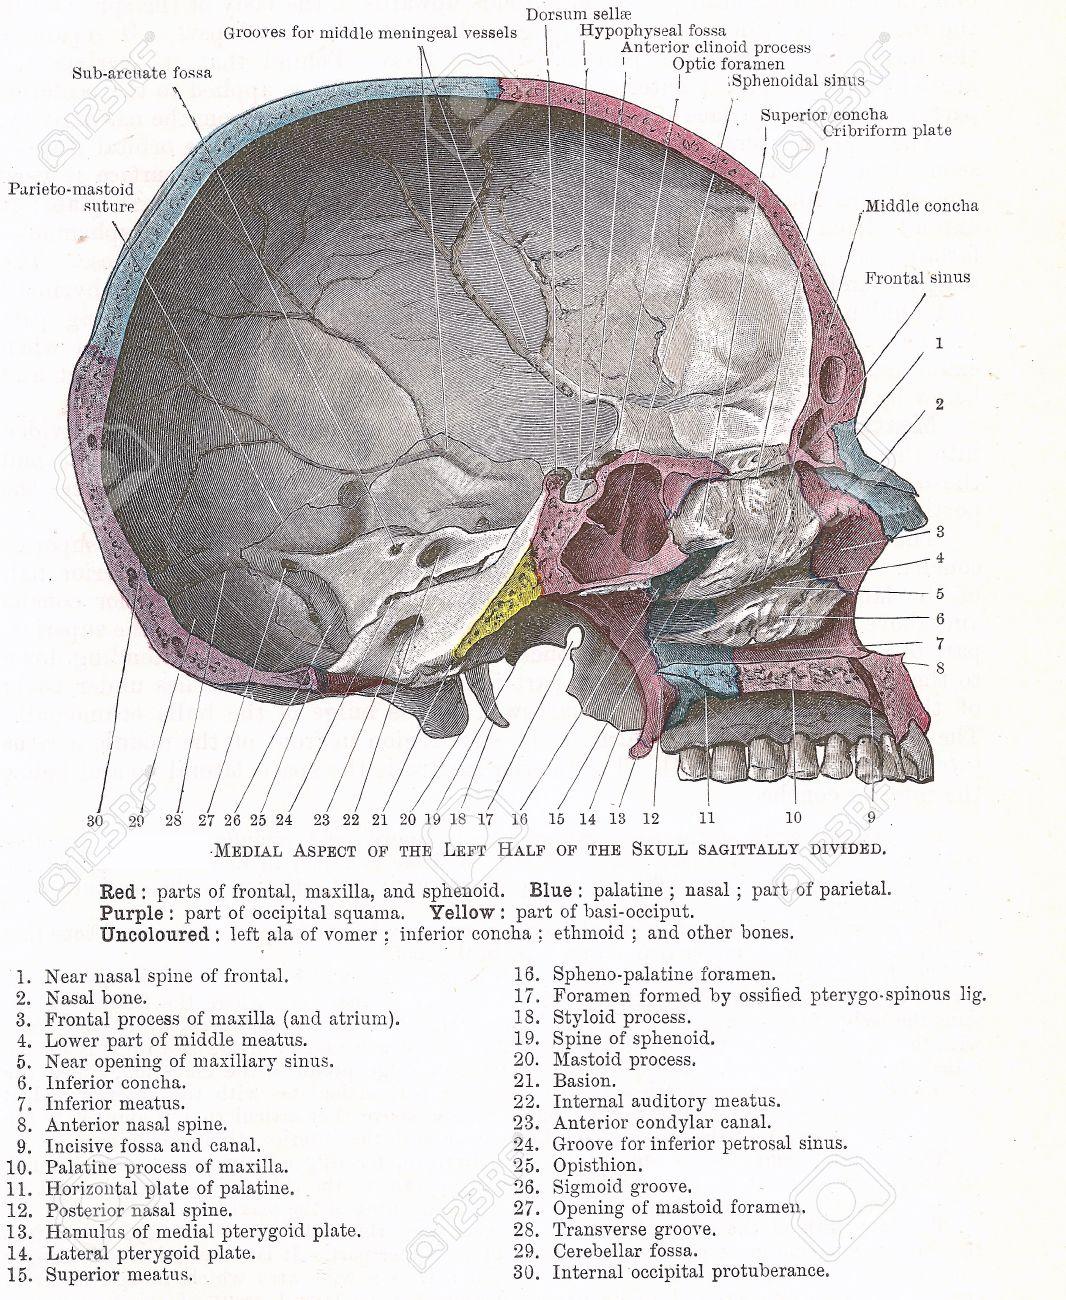 Posterior Nasal Spine